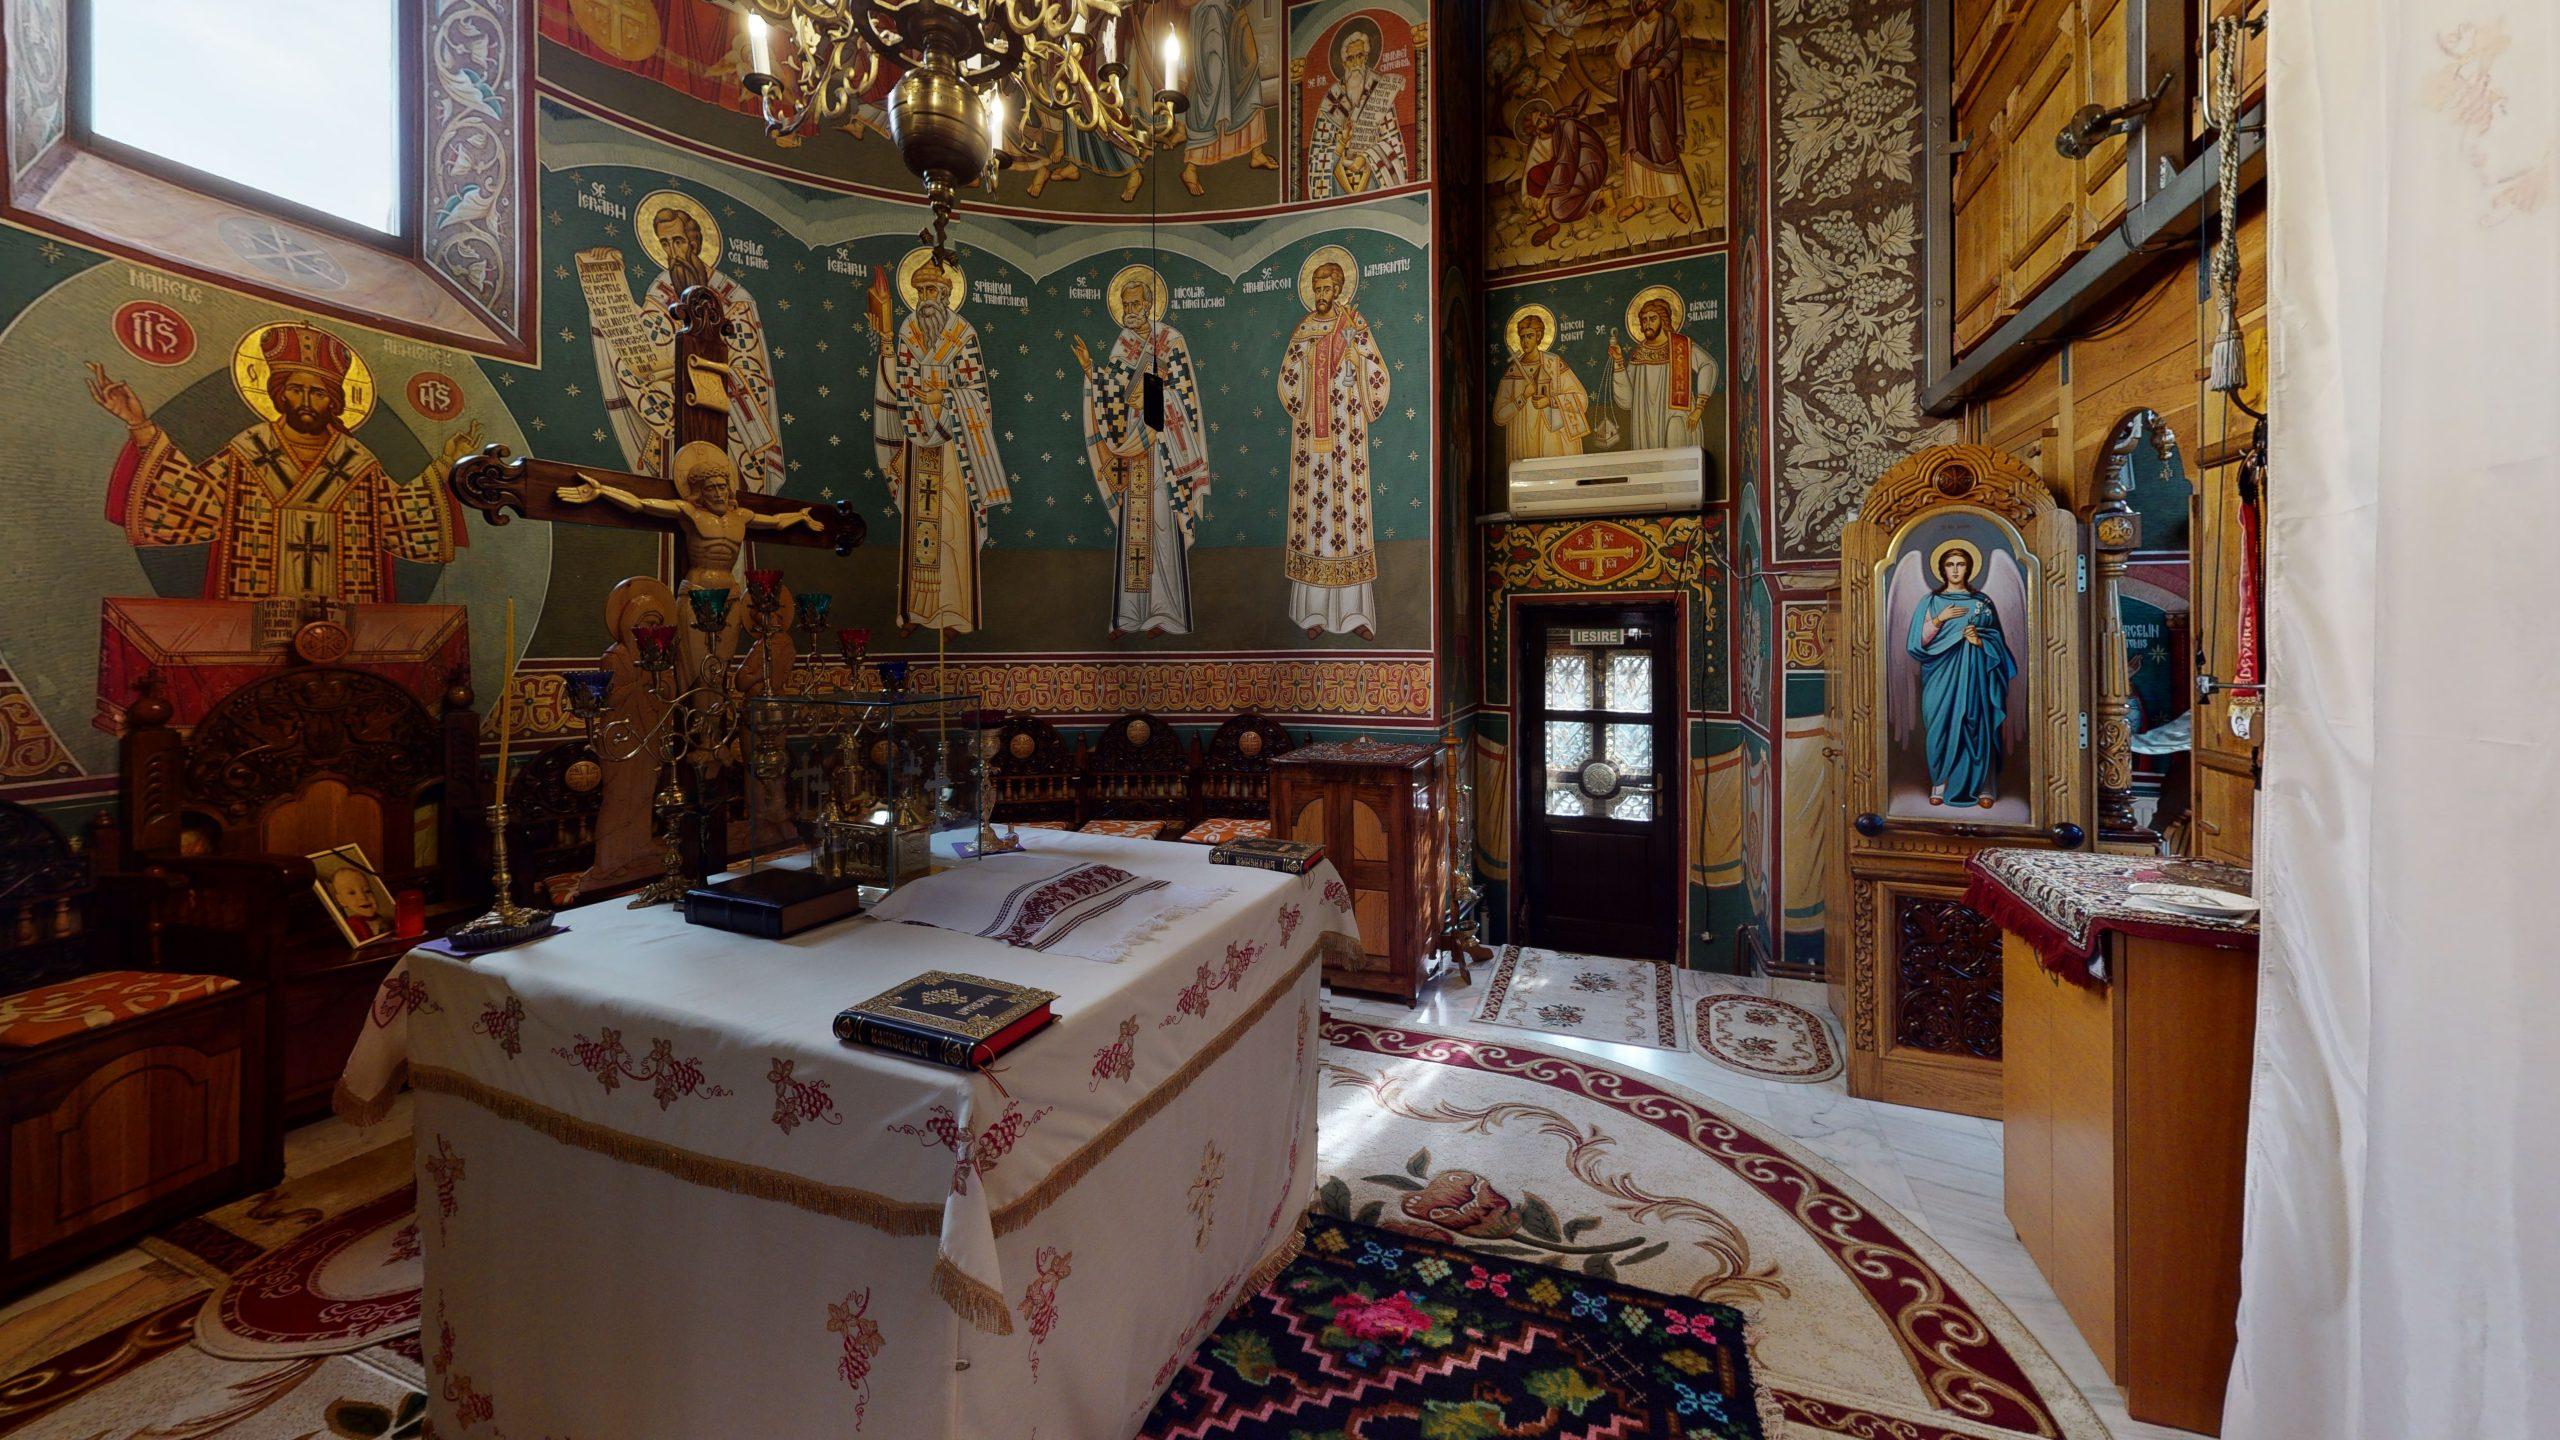 Biserica-Sfintii-Trei-Ierarhi-Flamanzi-Bedroom(1)